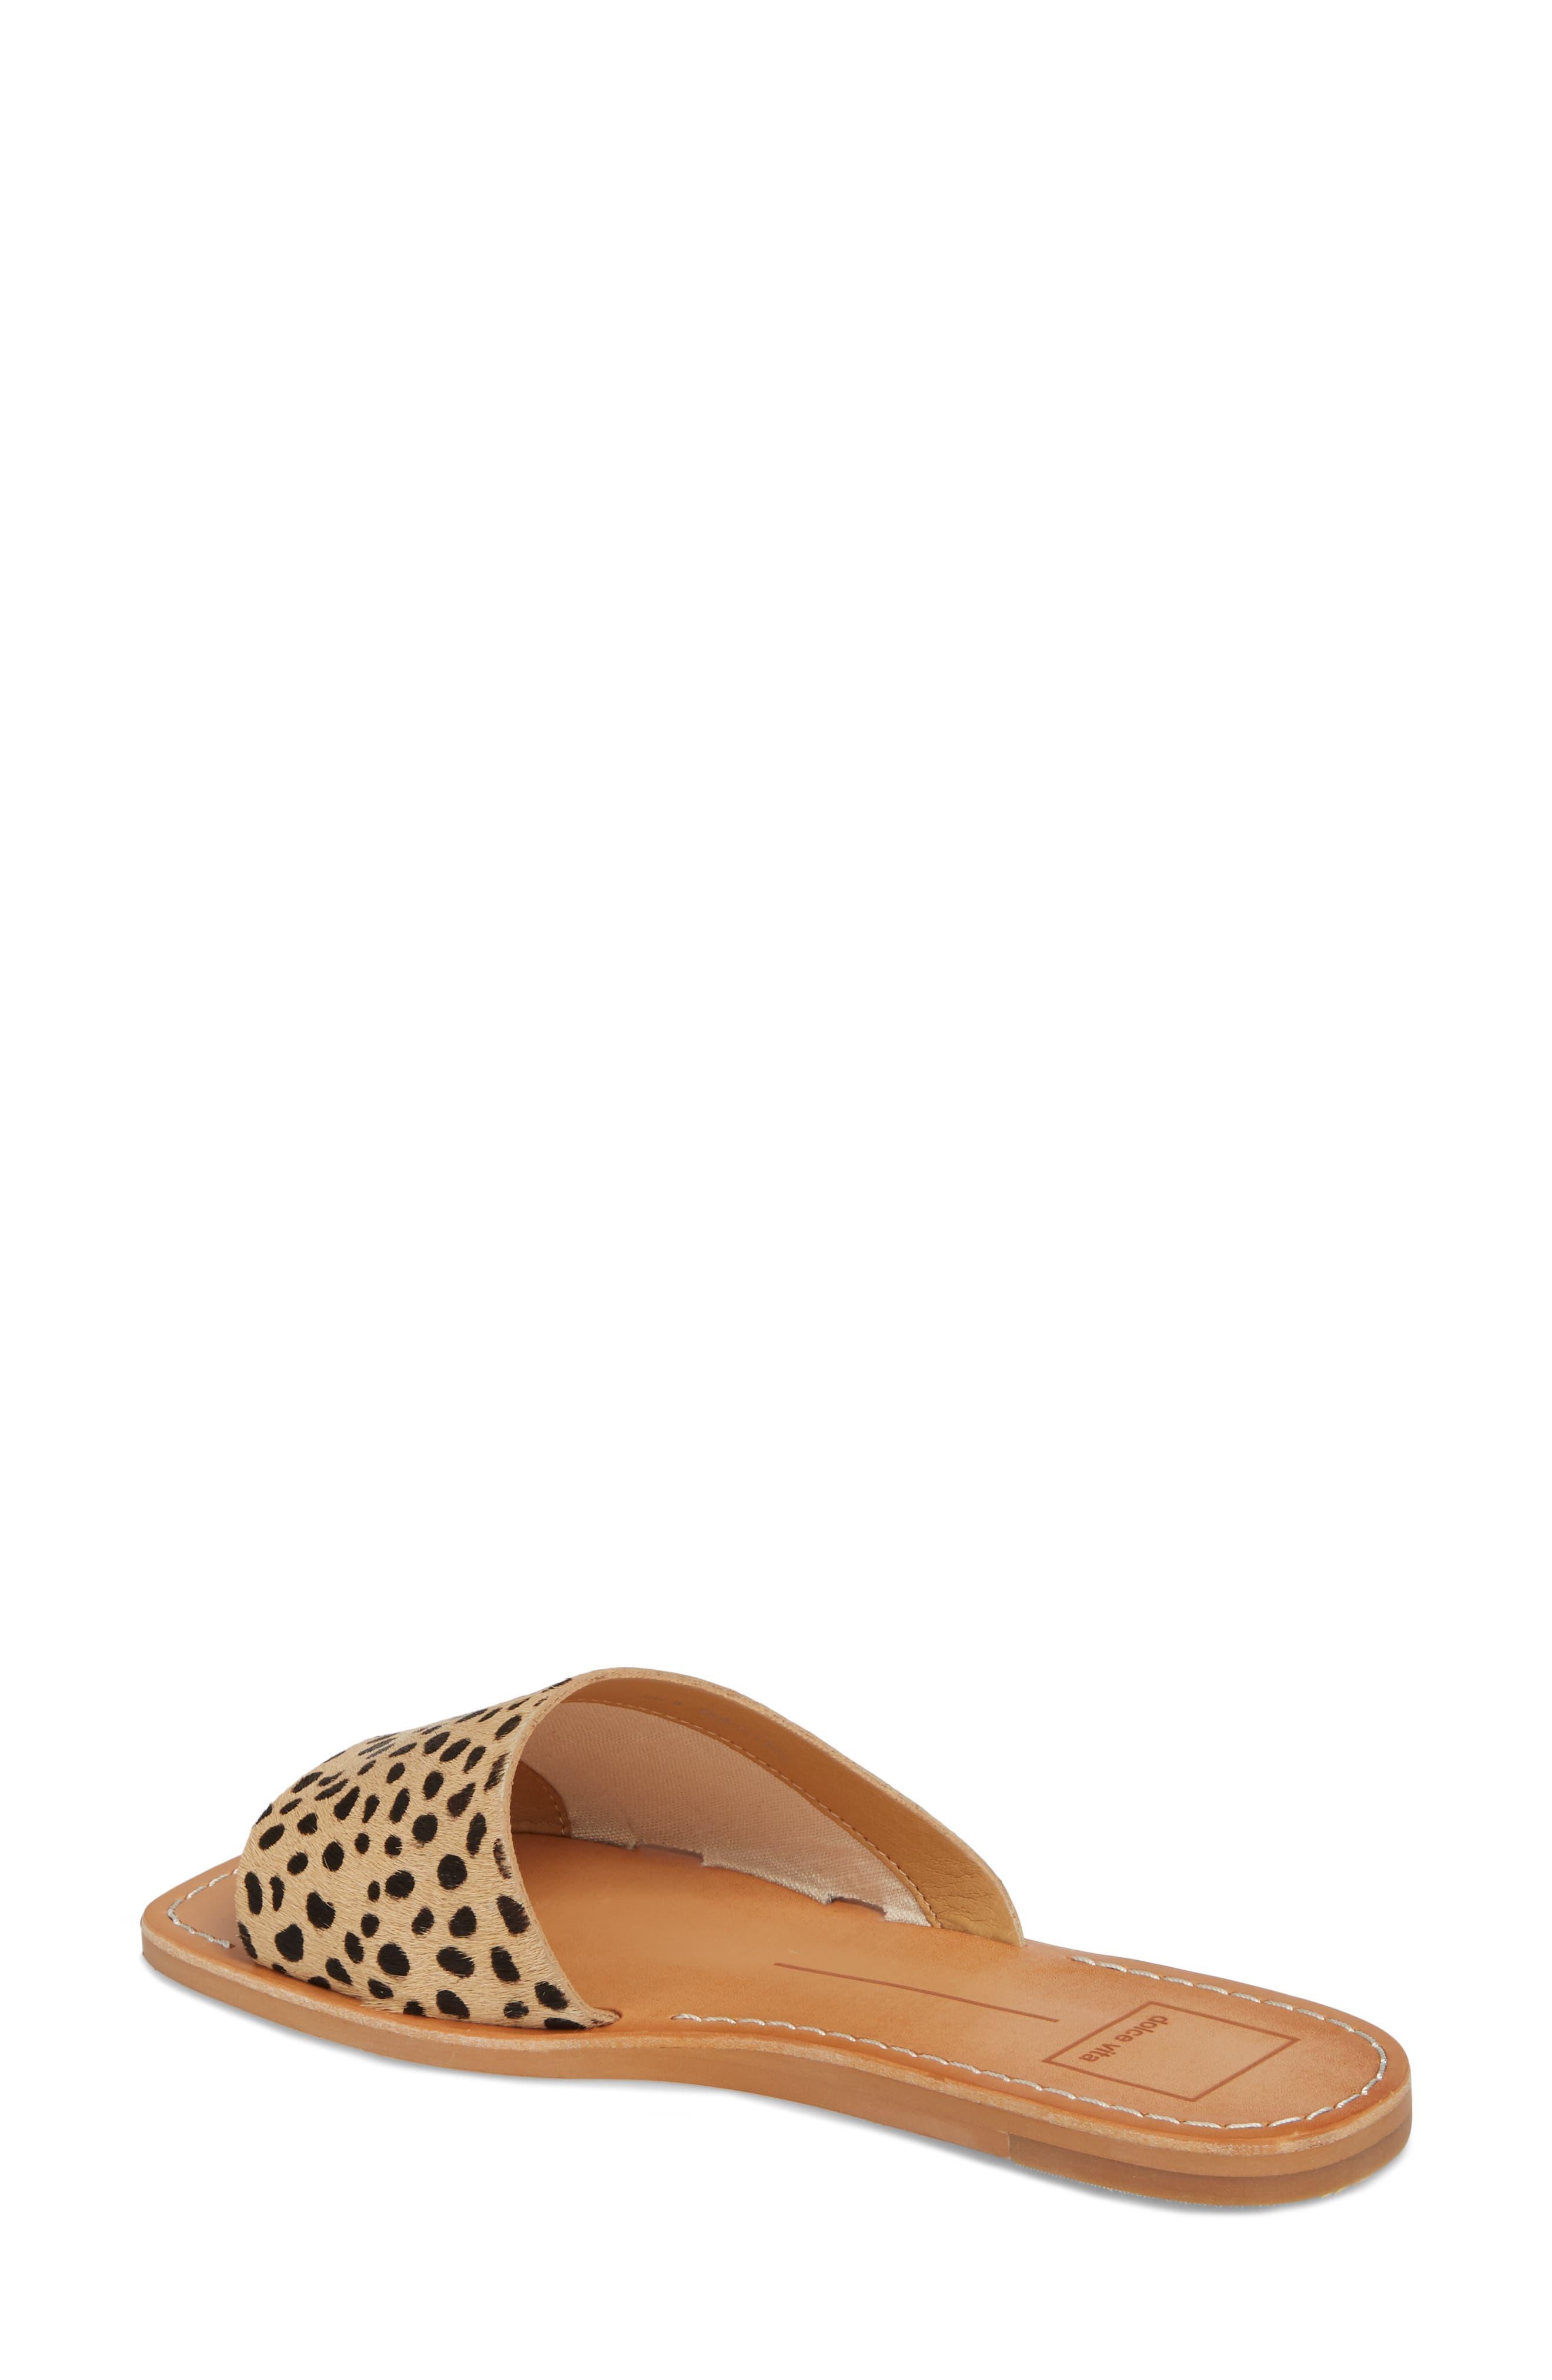 Cato Genuine Calf Hair Slide Sandal,                             Alternate thumbnail 2, color,                             Leopard Calf Hair